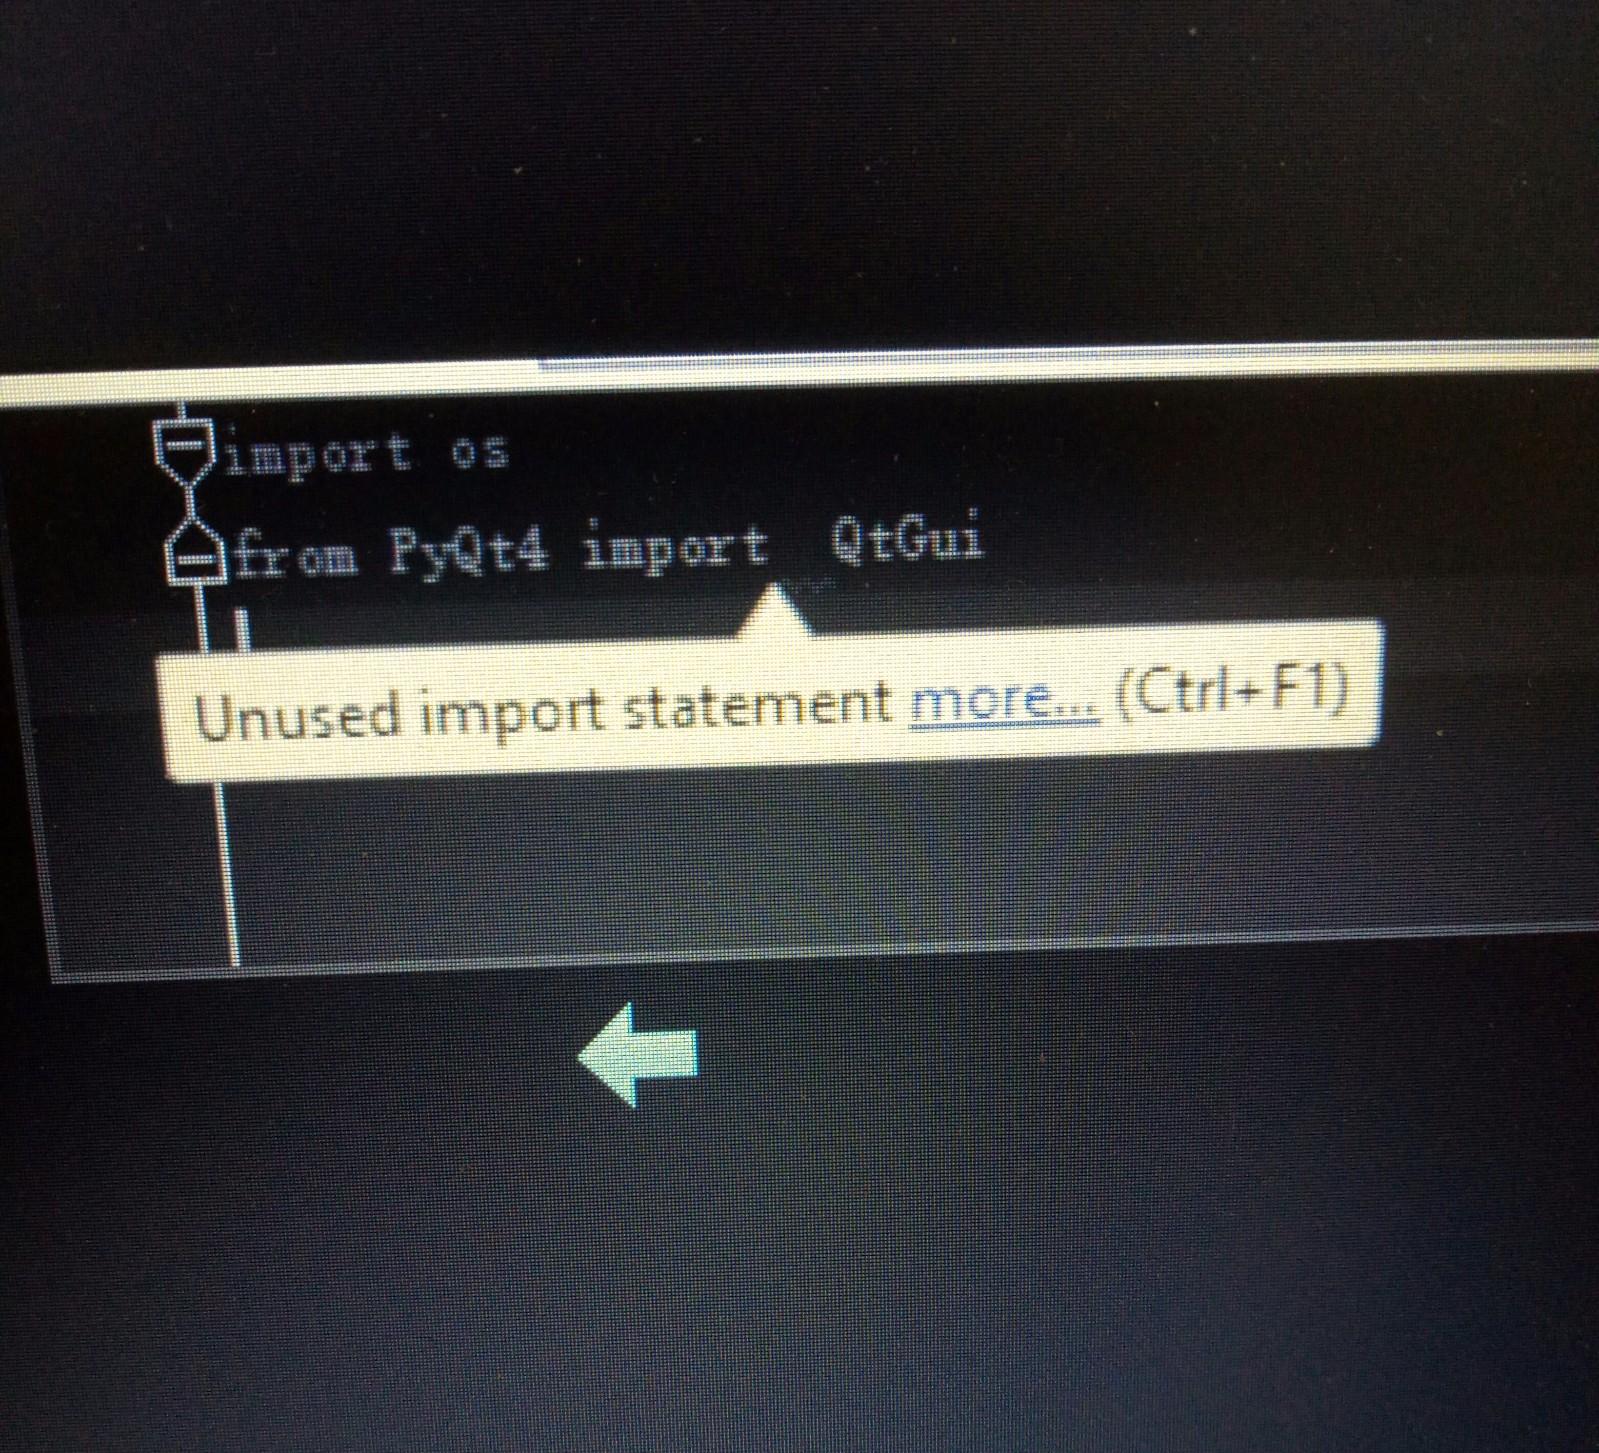 export是什么意思_pycharm unused import statement 是什么原因?_百度知道